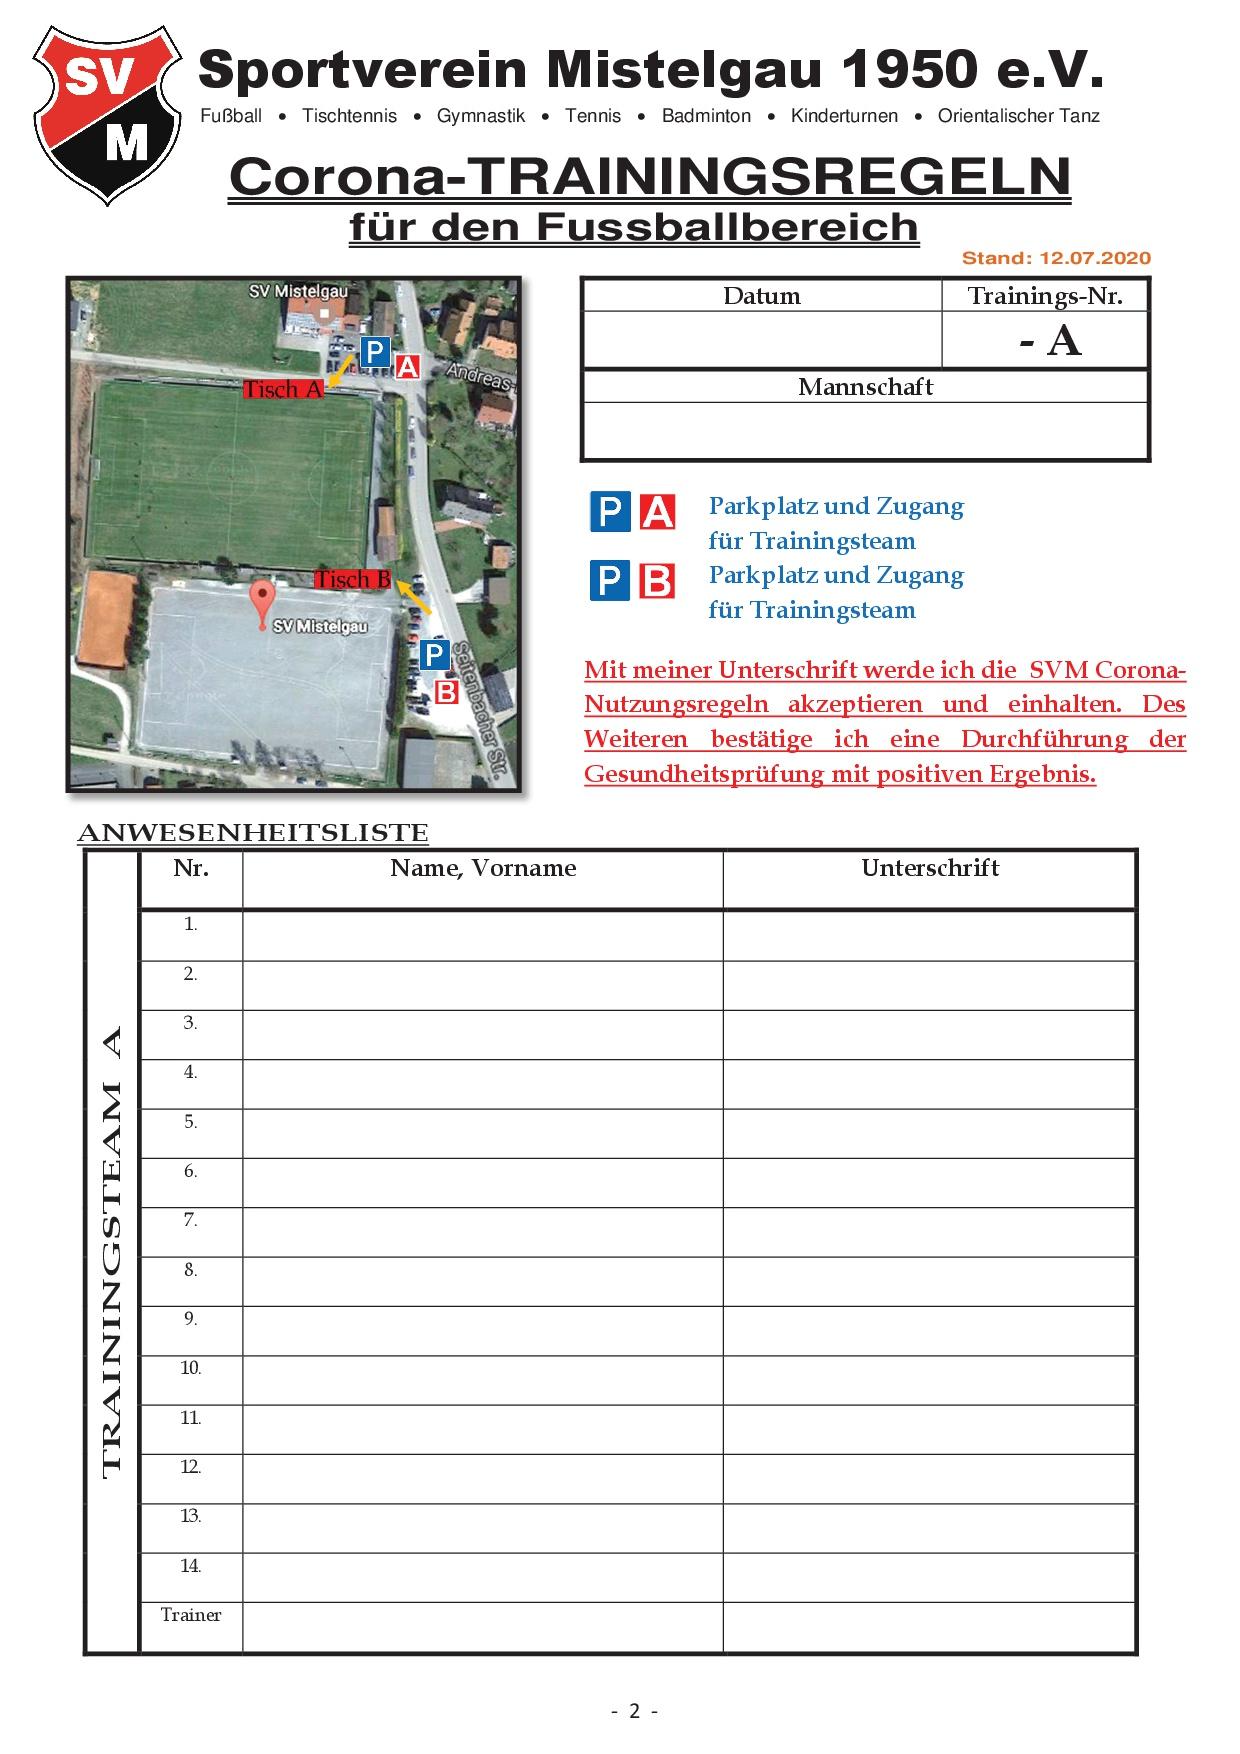 Covid19_Trainingsregeln_20200712A.pdf